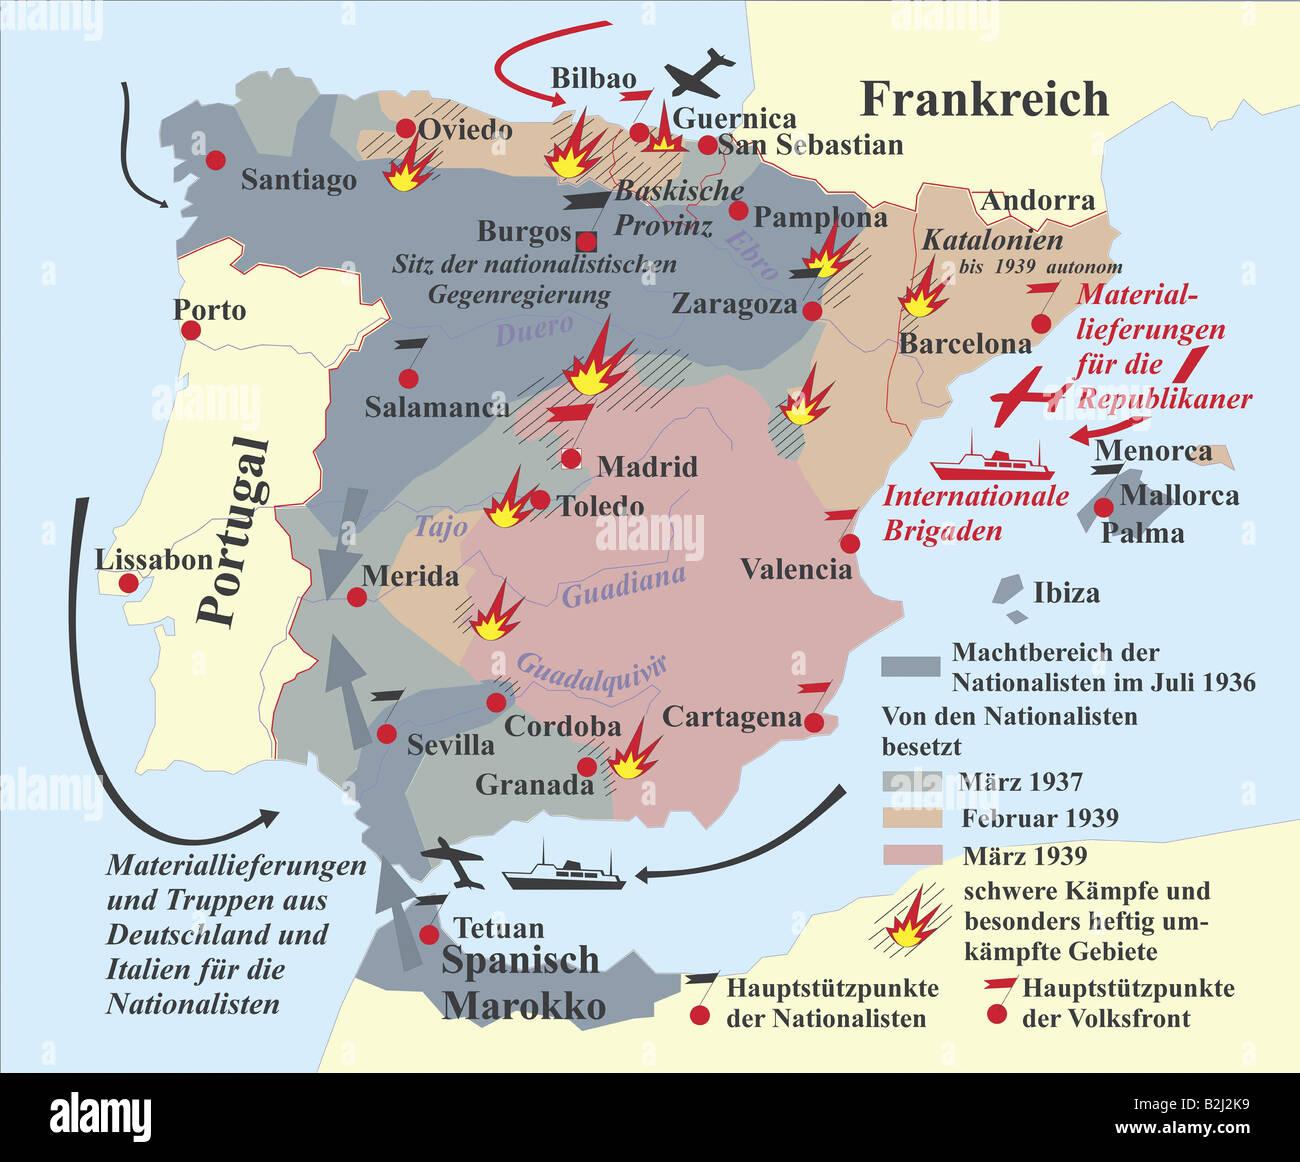 cartography, historical maps, Spain, Spanish Civil War 1936 - 1939 ...